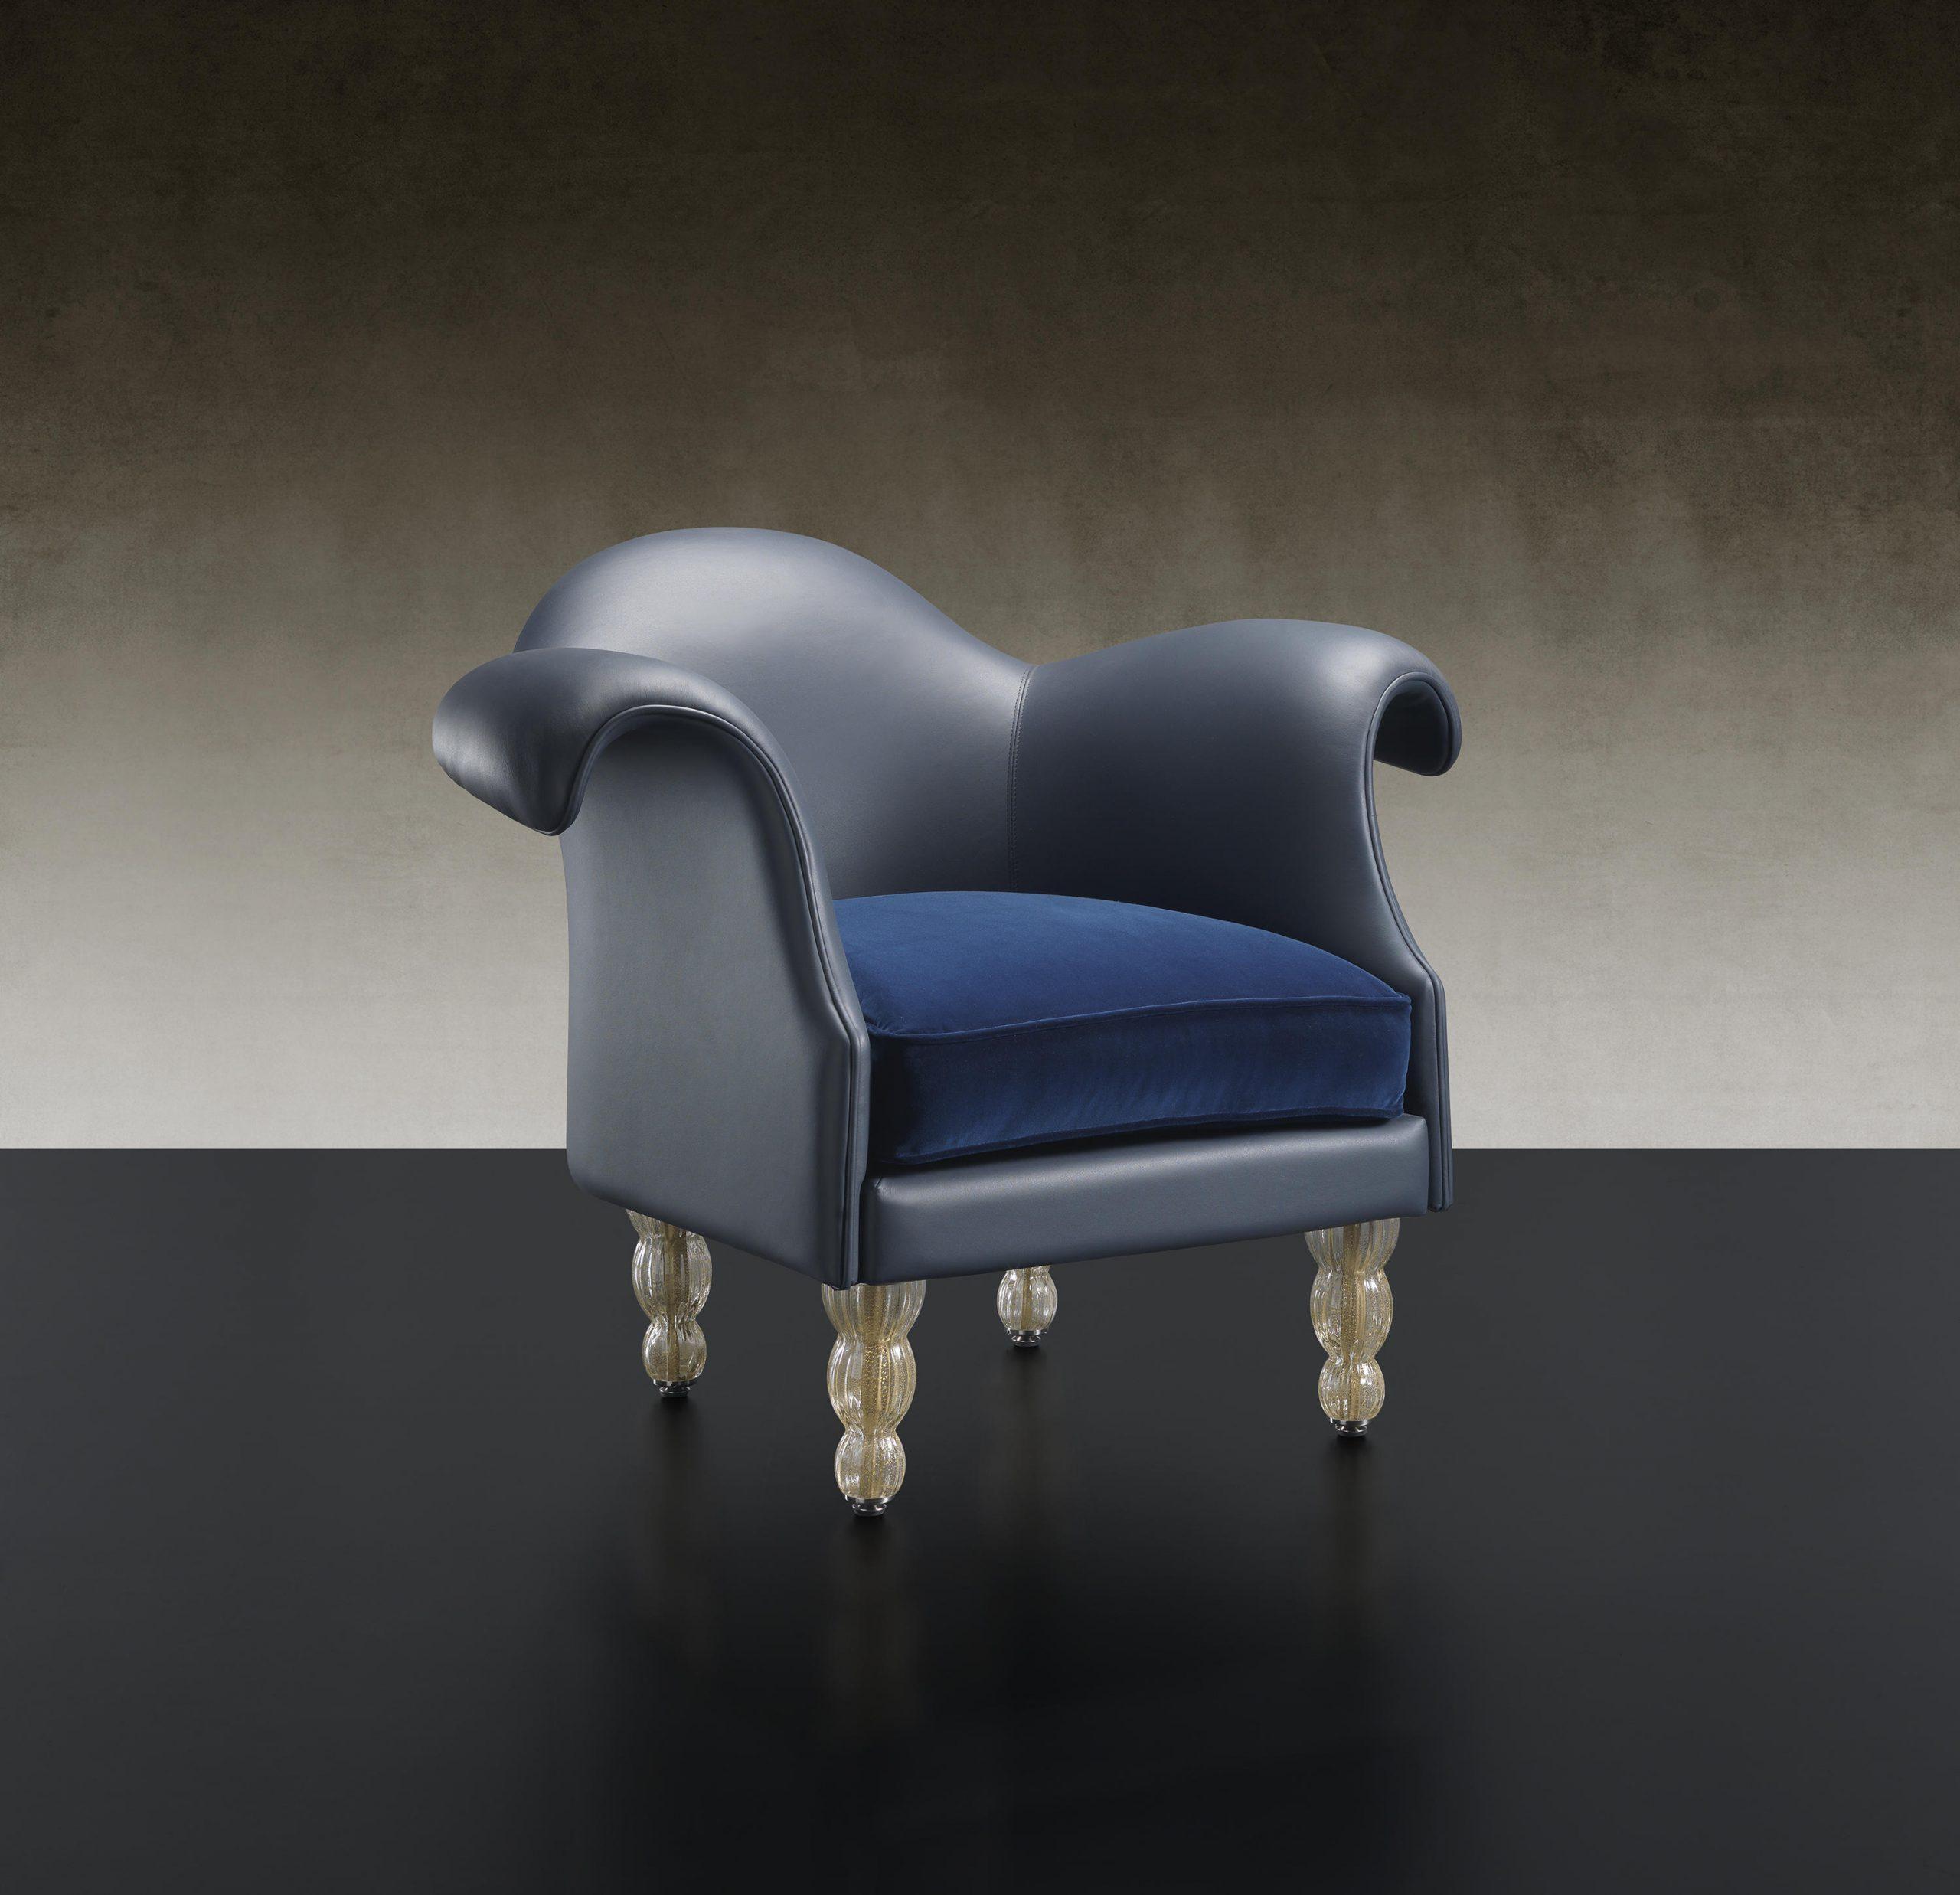 Casanova Fauteuil & Mobilier Design | Architonic tout Casanova Canapé Italien